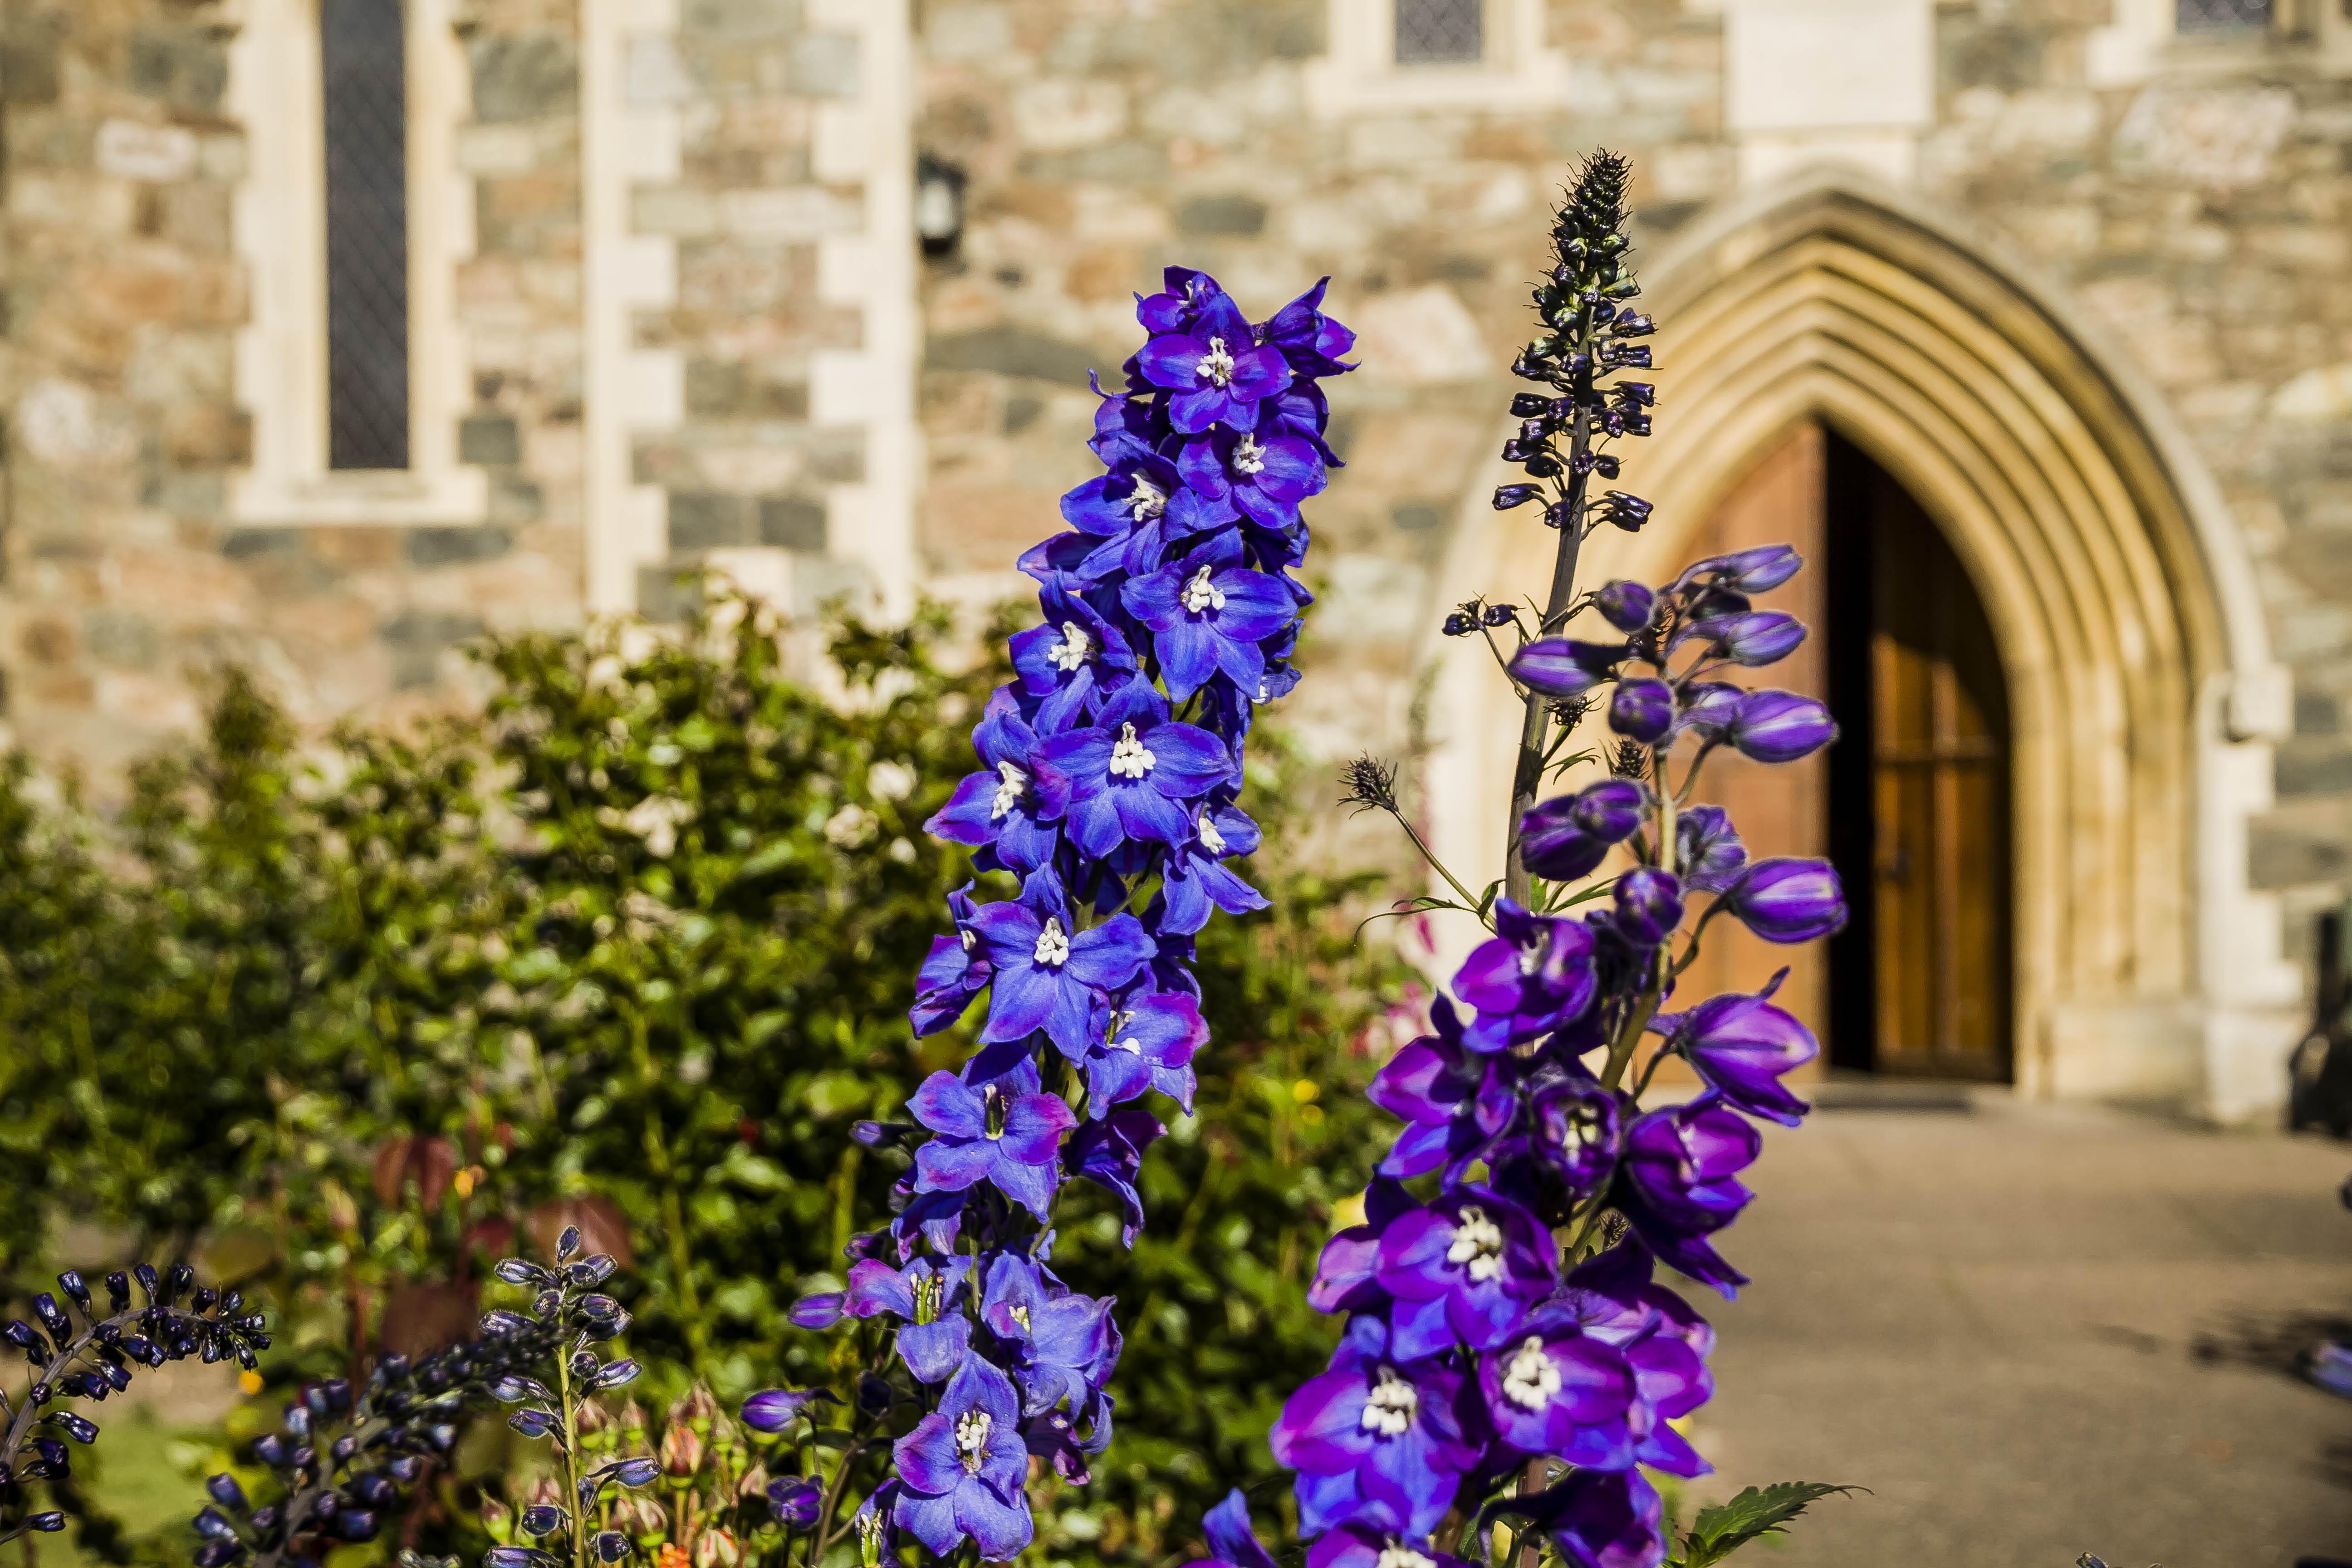 Mount Saint Bernard Abbey – A Cistercian monastic community in the